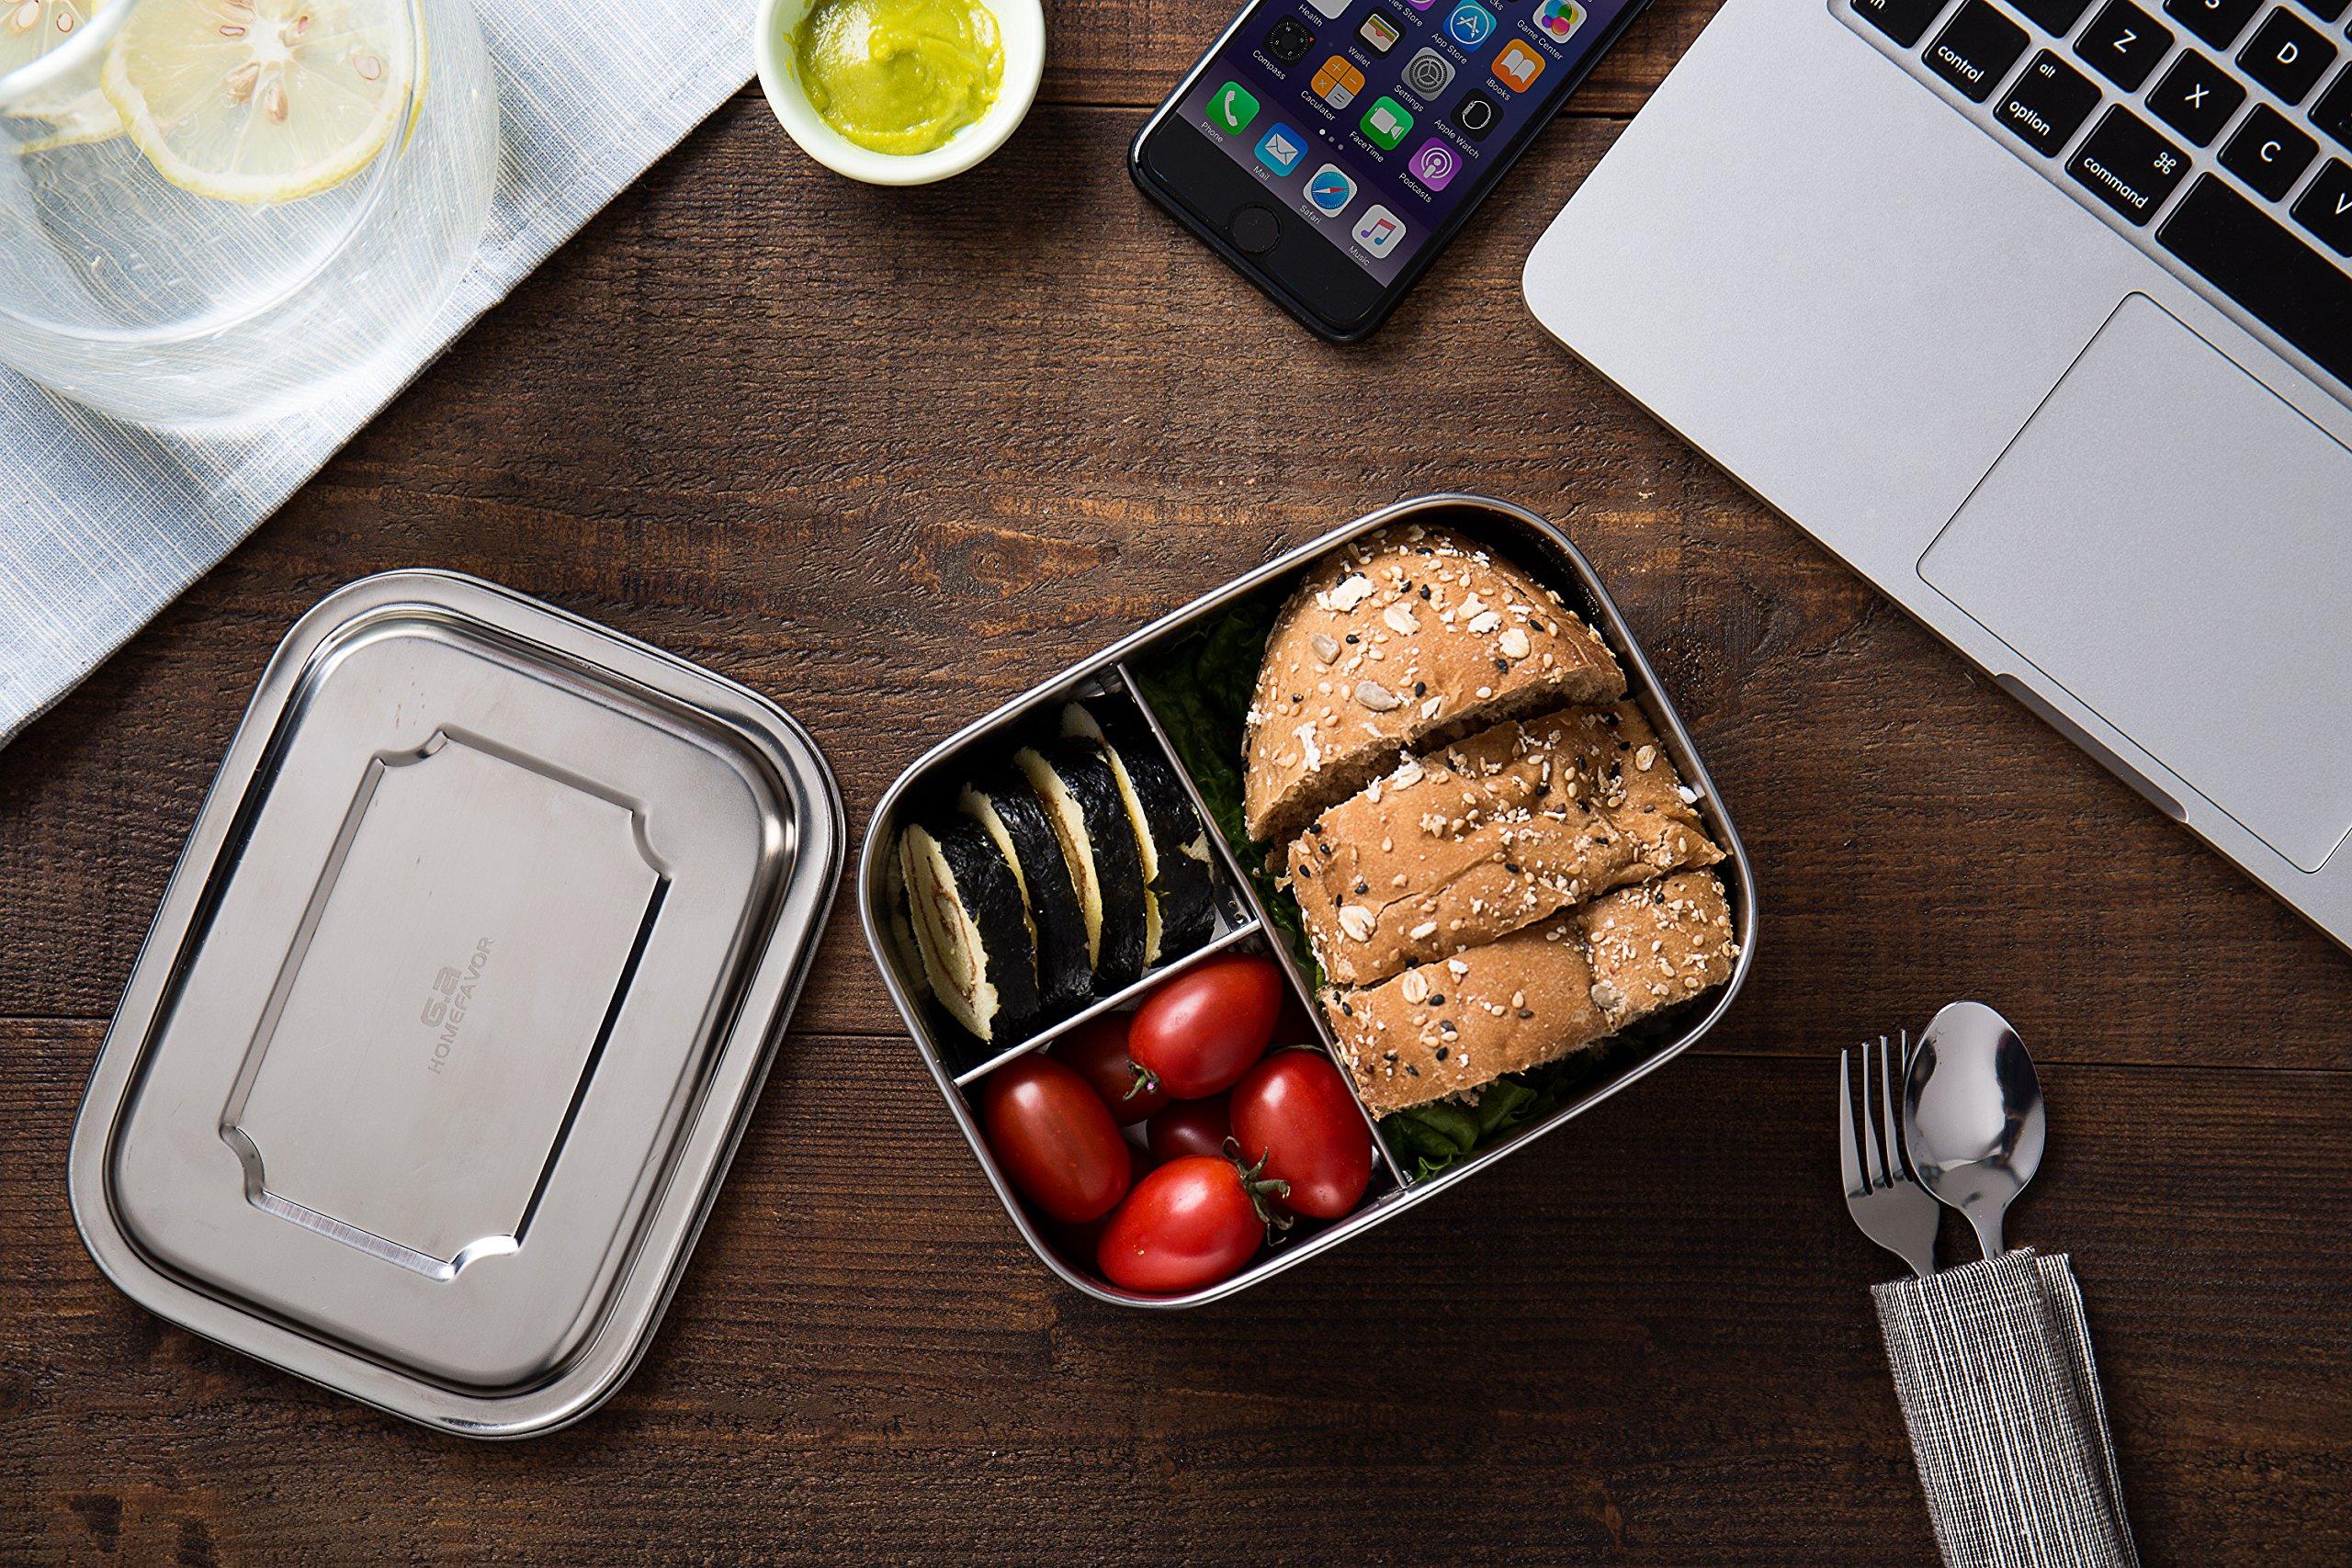 pranzo in realtà dating app Velocità datazione Vlaams Brabant